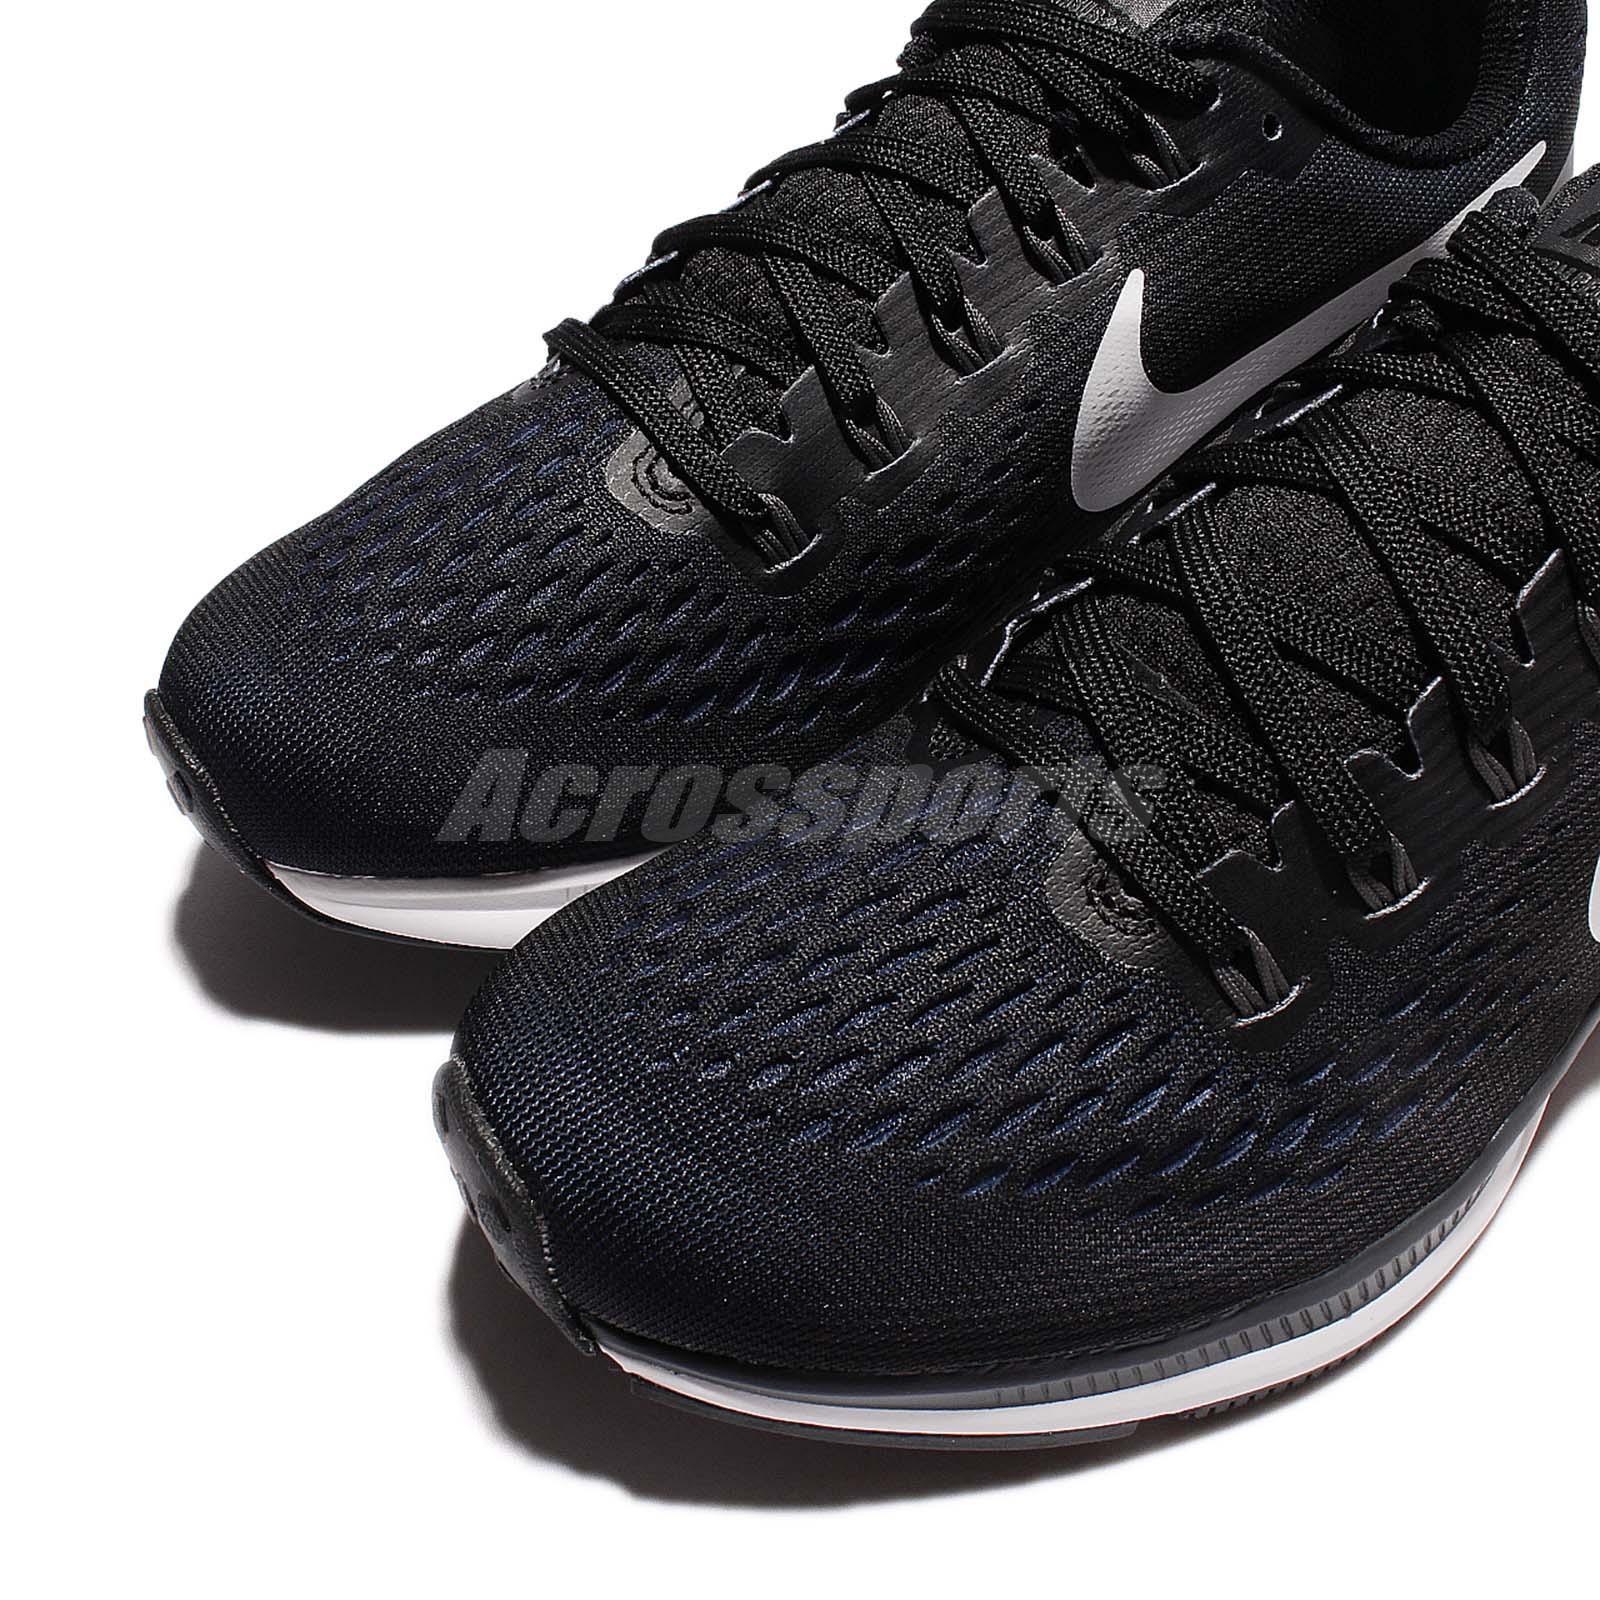 Detalles acerca de Nike Mujeres Air Zoom Pegasus 34 Negro Blanco para Mujeres Tenis Calzado para Correr 880560 001 mostrar título original